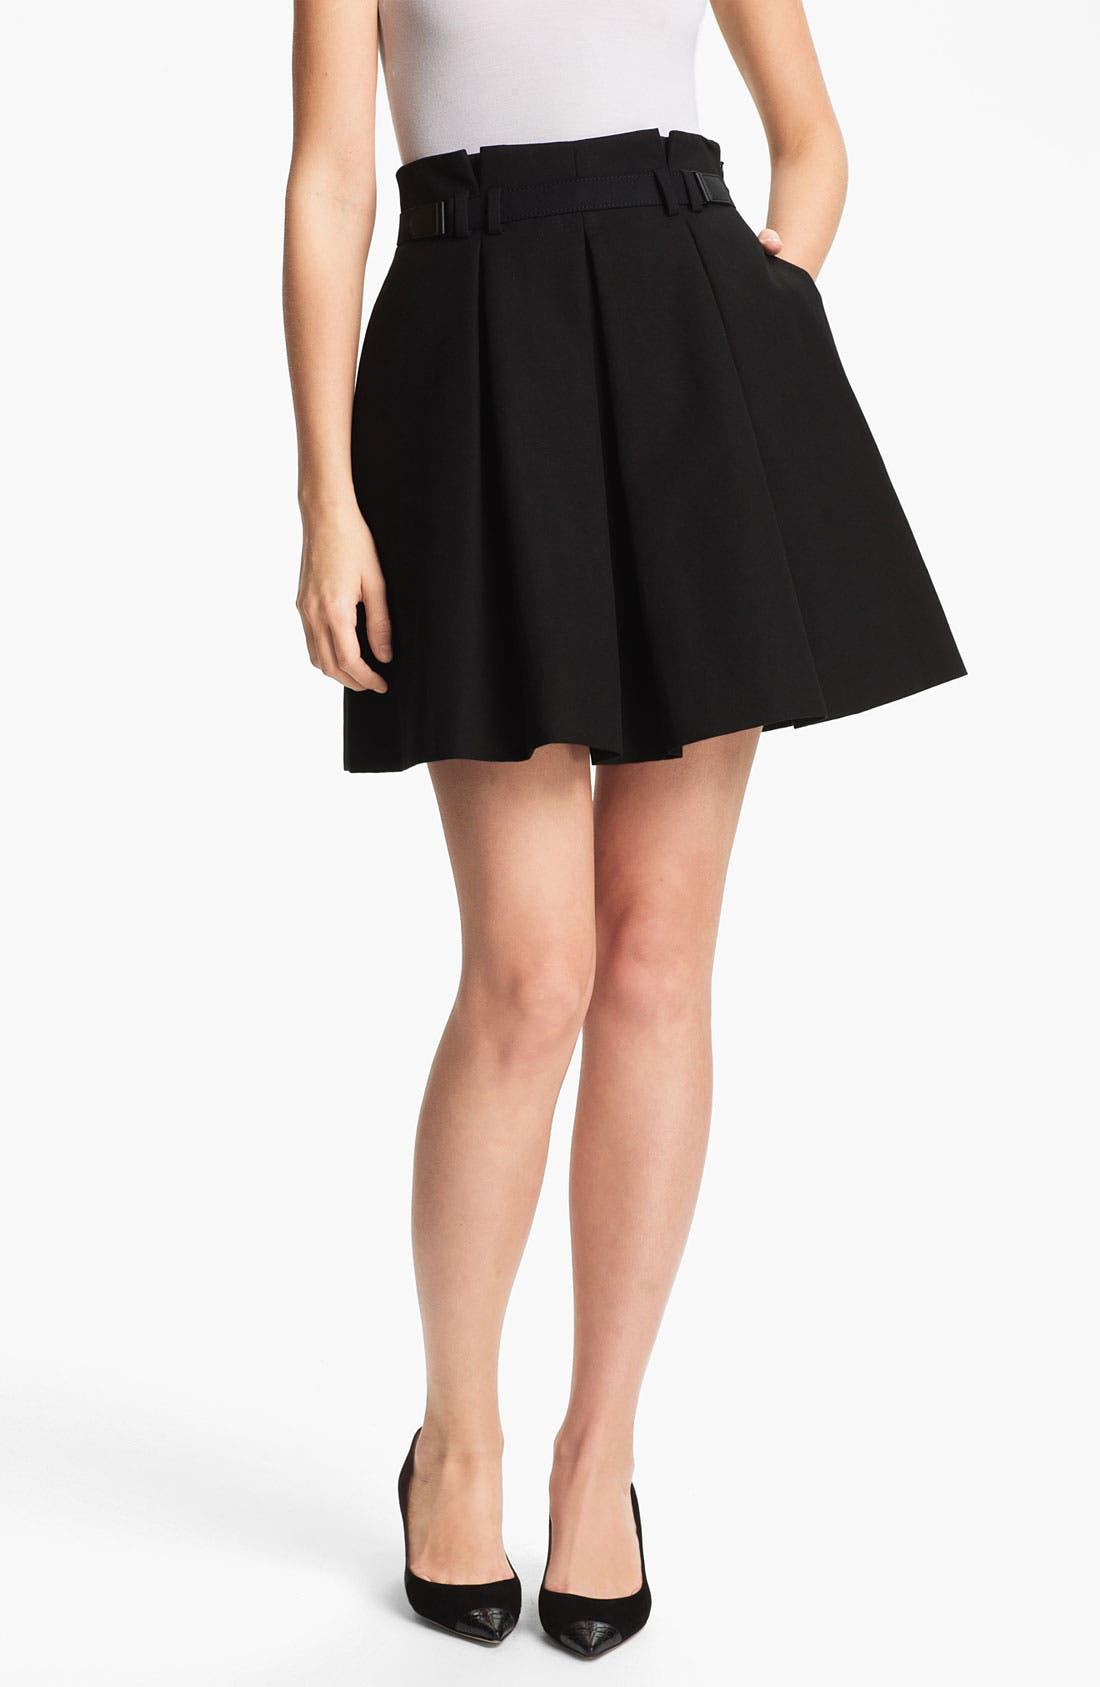 Alternate Image 1 Selected - Miss Wu Pleated Skirt (Nordstrom Exclusive)